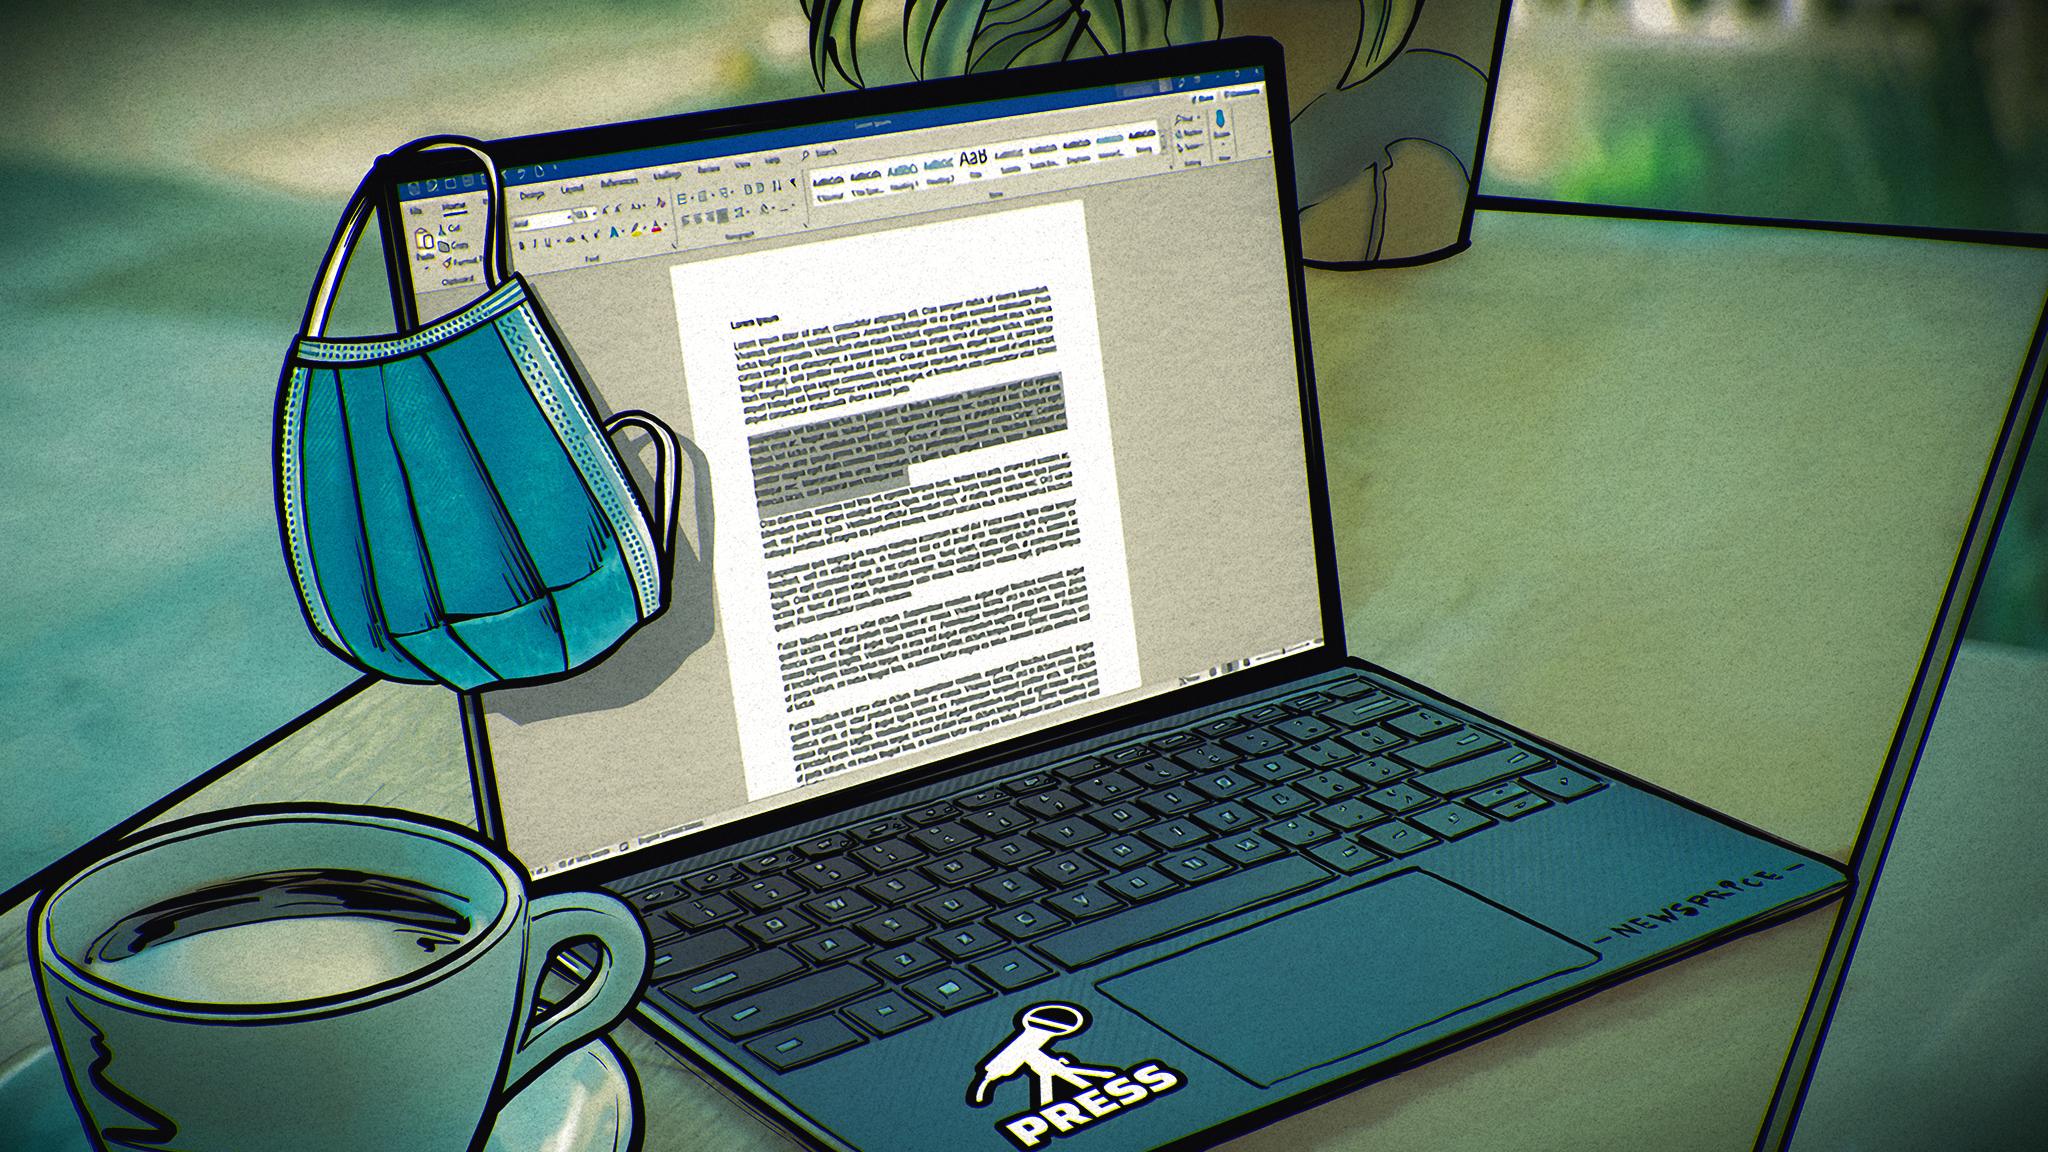 Как журналисту-фрилансеру работать в условиях пандемии Covid-19